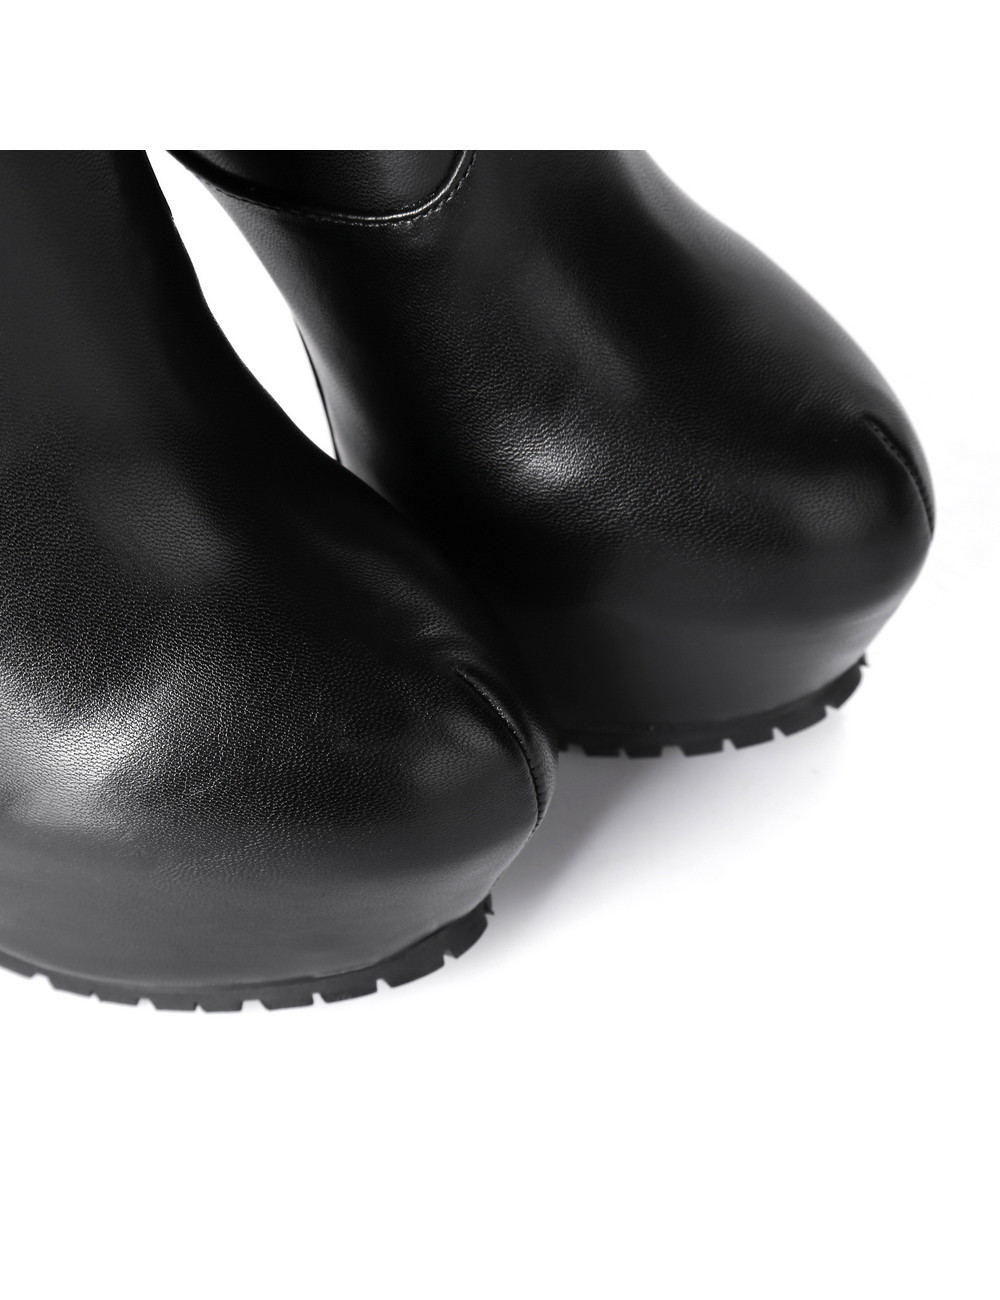 Giaro Giaro Cameron schwarze matte Kniestiefel - Reißverschluss hinten